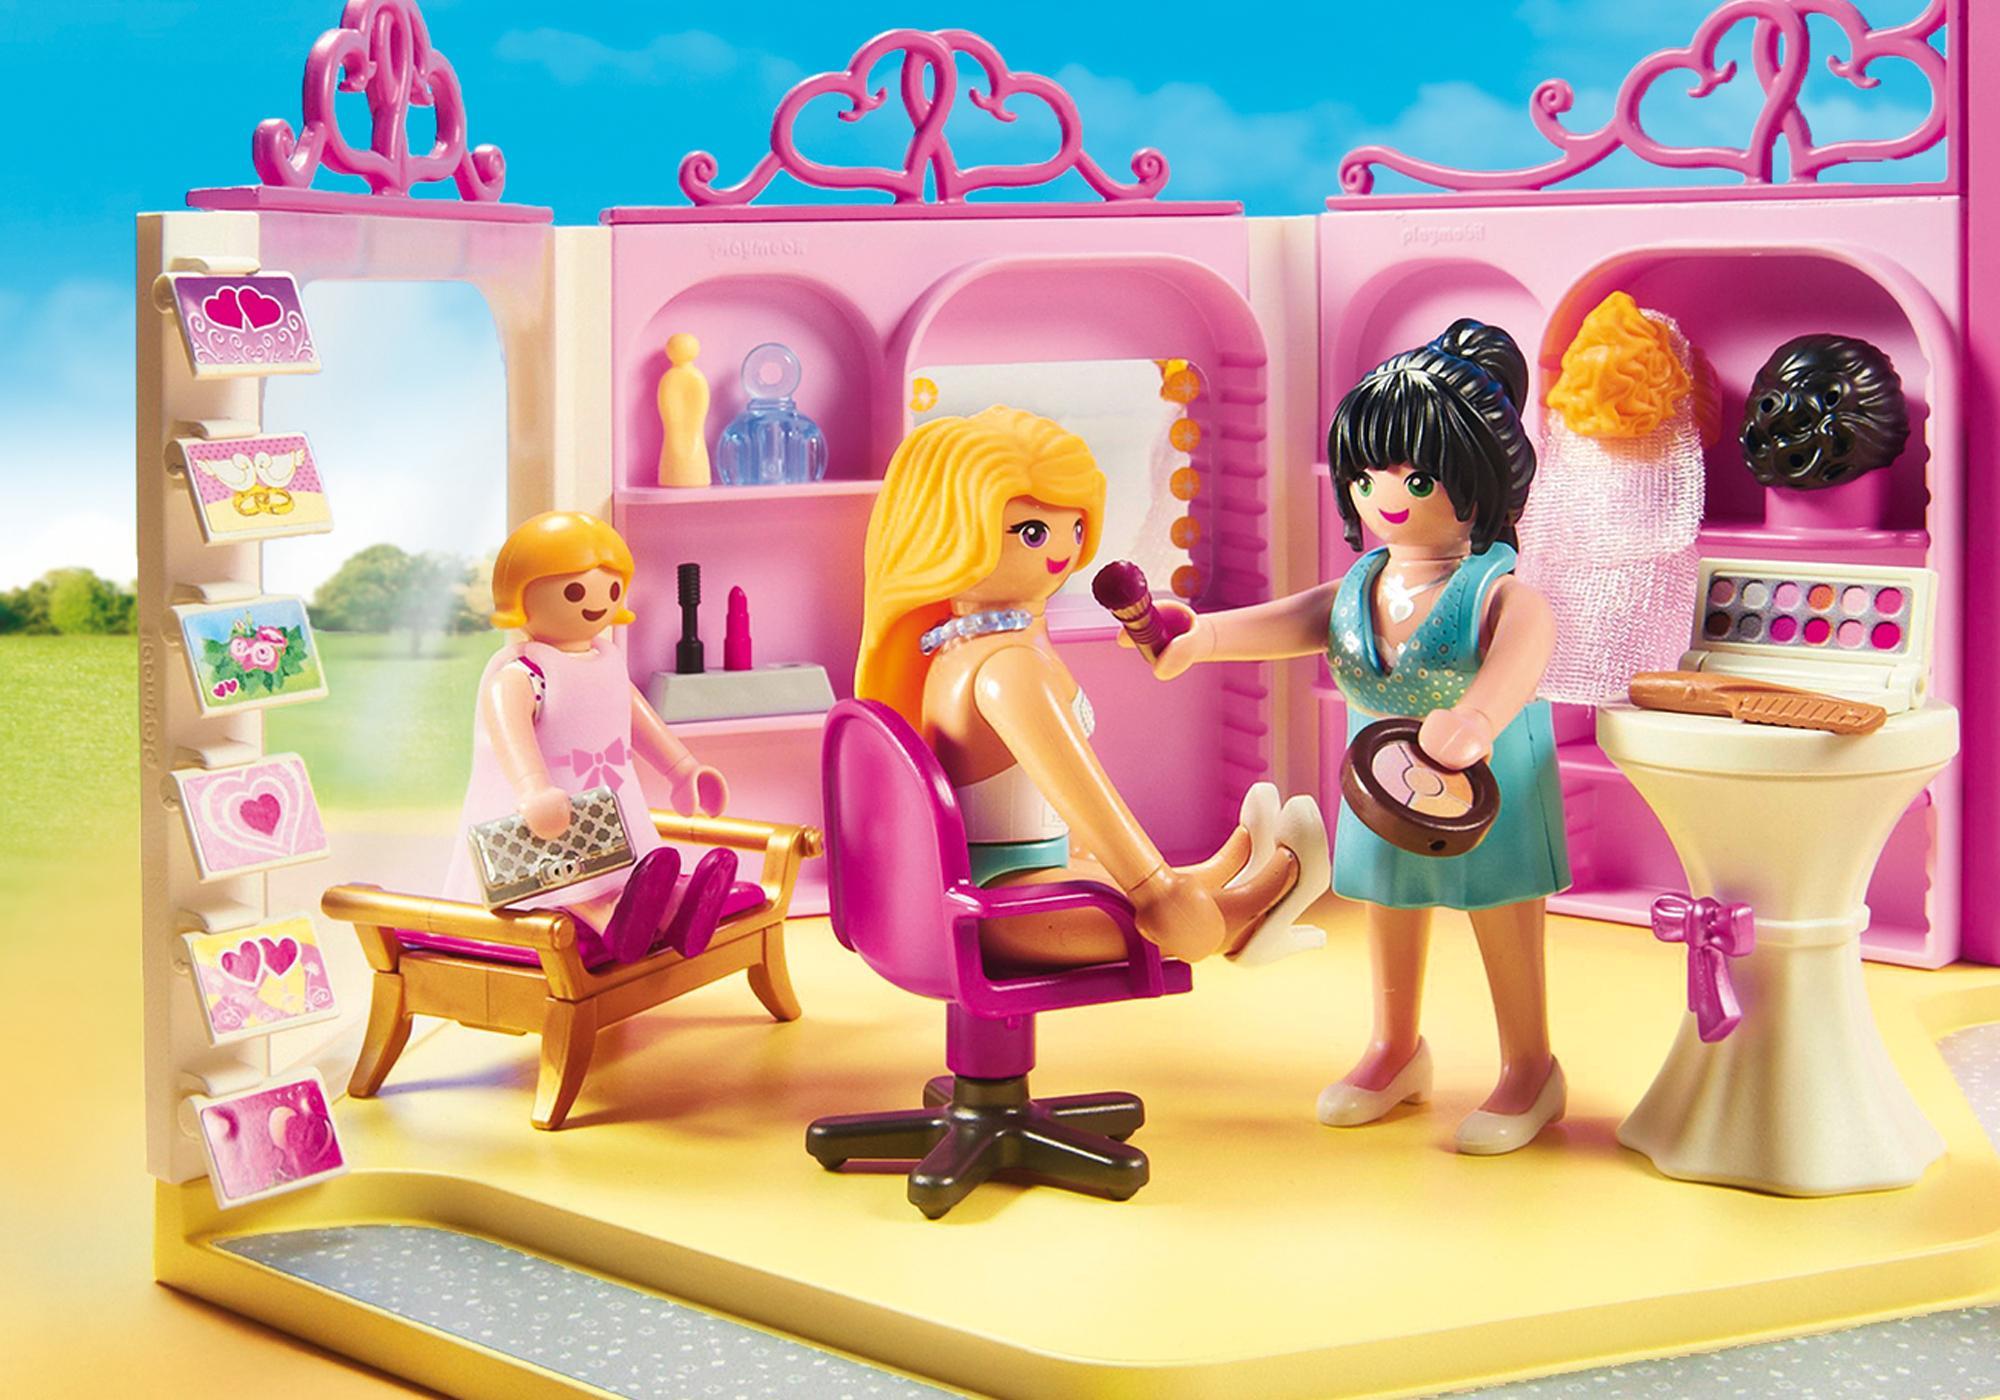 http://media.playmobil.com/i/playmobil/9226_product_extra1/Κατάστημα νυφικών με σαλόνι ομορφιάς